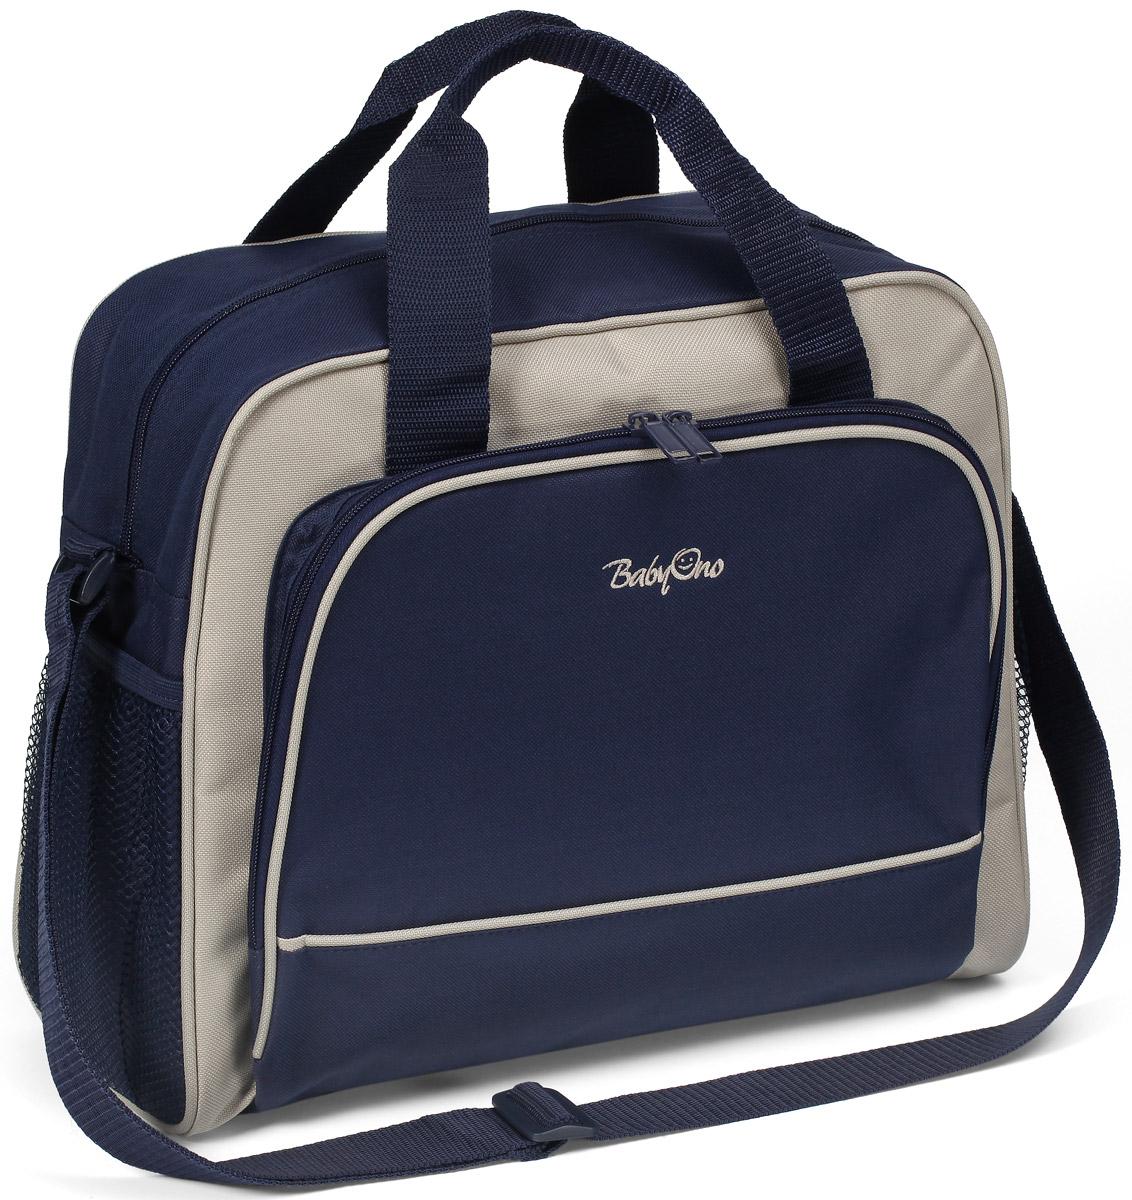 BabyOno Сумка для мамы Basic цвет синий светло-серый алиэкспресс сумка для мамы